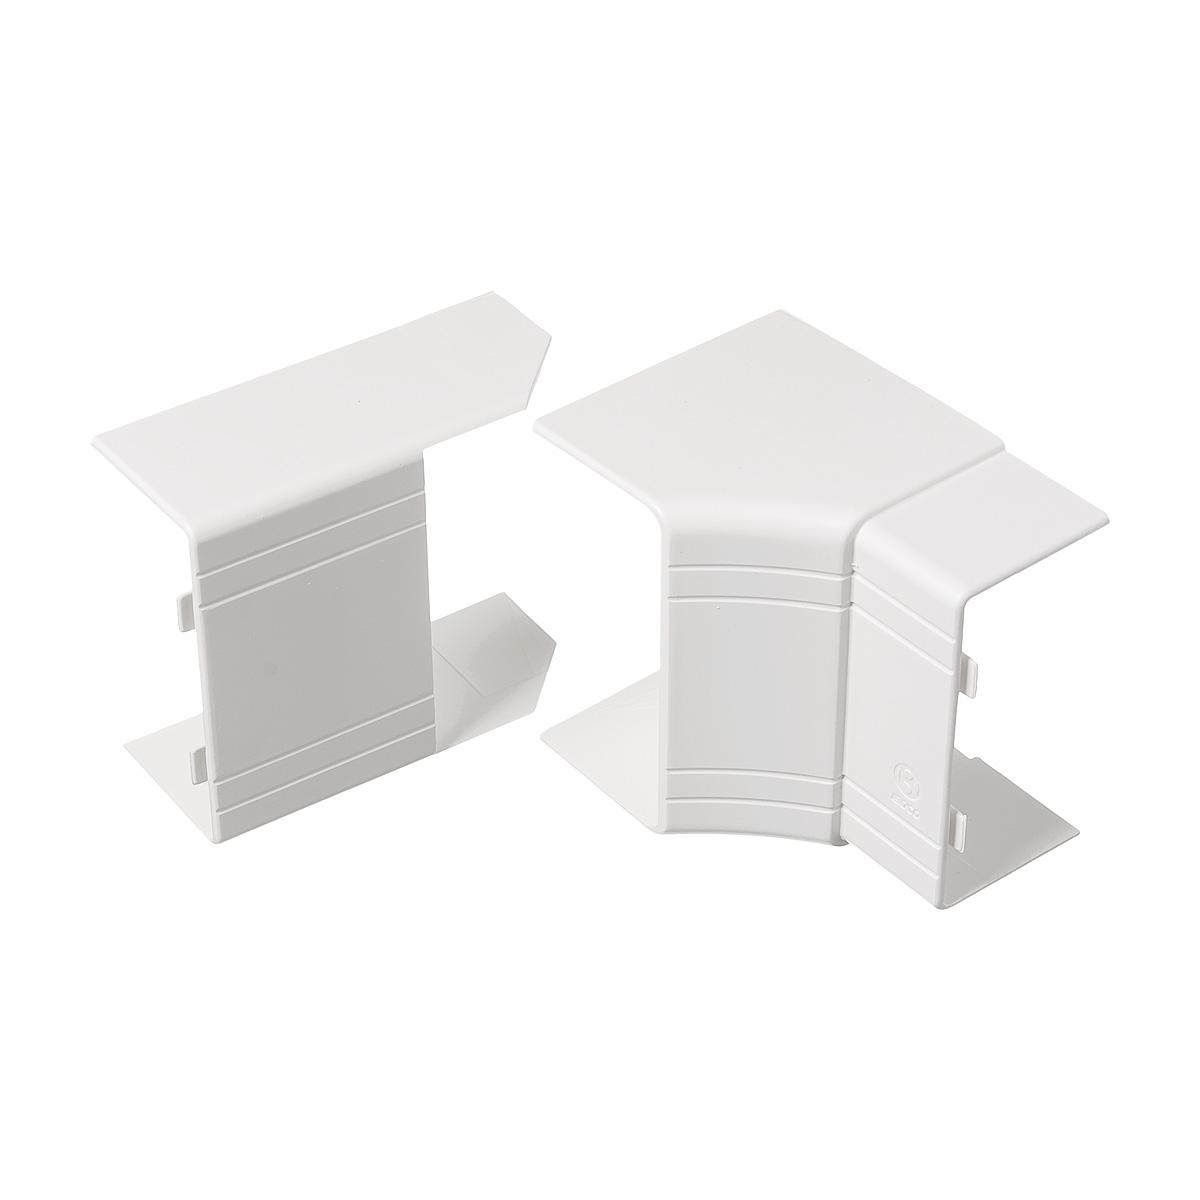 Внутренний угол изменяемый для кабель-канала ДКС 80х40 мм белый  угол изменяемый внешний dkc 1шт серый 01052